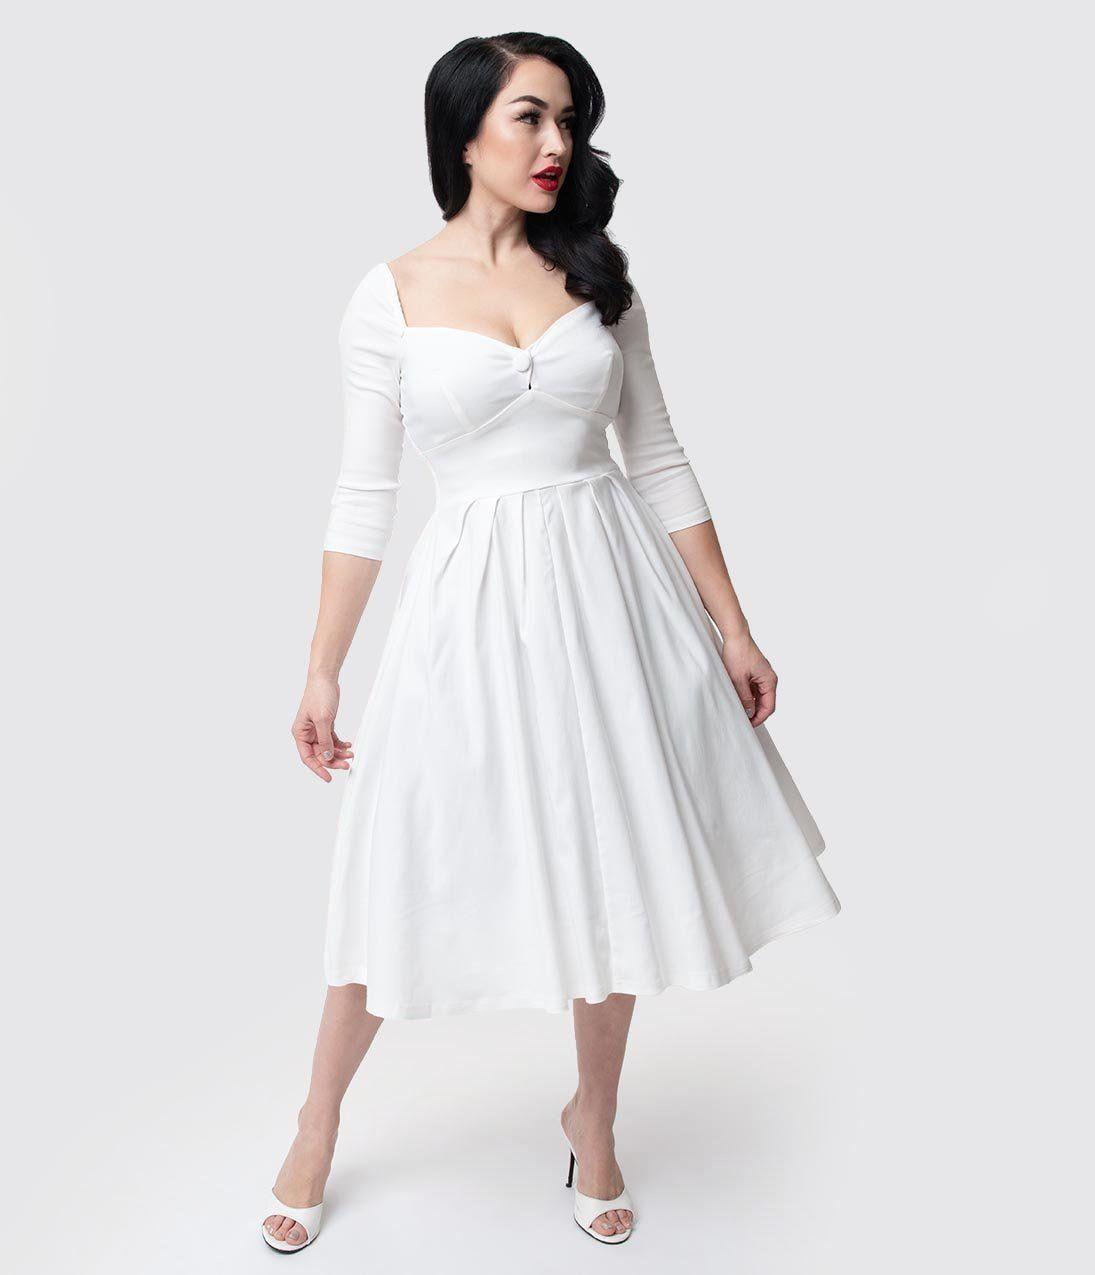 Vintage Inspired Wedding Dress Vintage Style Wedding Dresses Unique Vintage 1950s Style Ivory B Wedding Dresses Unique Ball Gown Wedding Dress Unique Dresses [ 1275 x 1095 Pixel ]